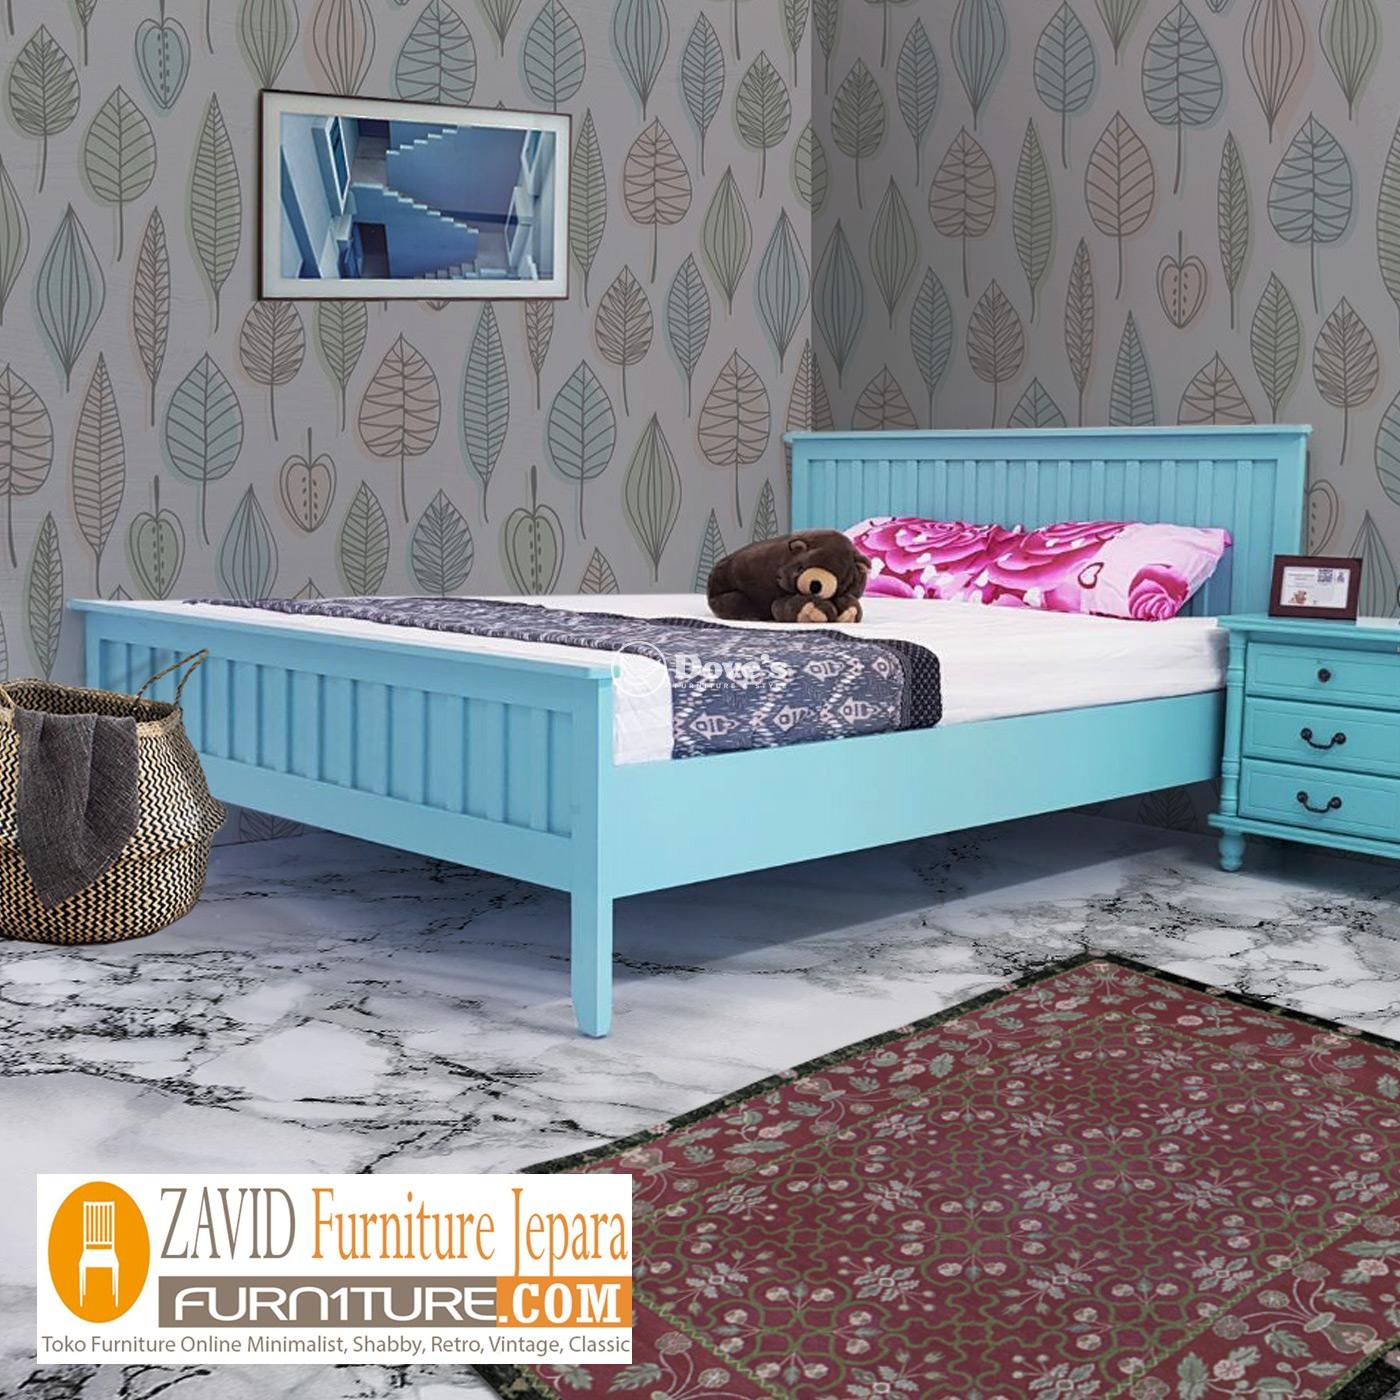 kamar-set-anak-warna-biru Tempat Tidur Anak Minimalis Warna Tosca Kayu Mahoni Model Terbaru